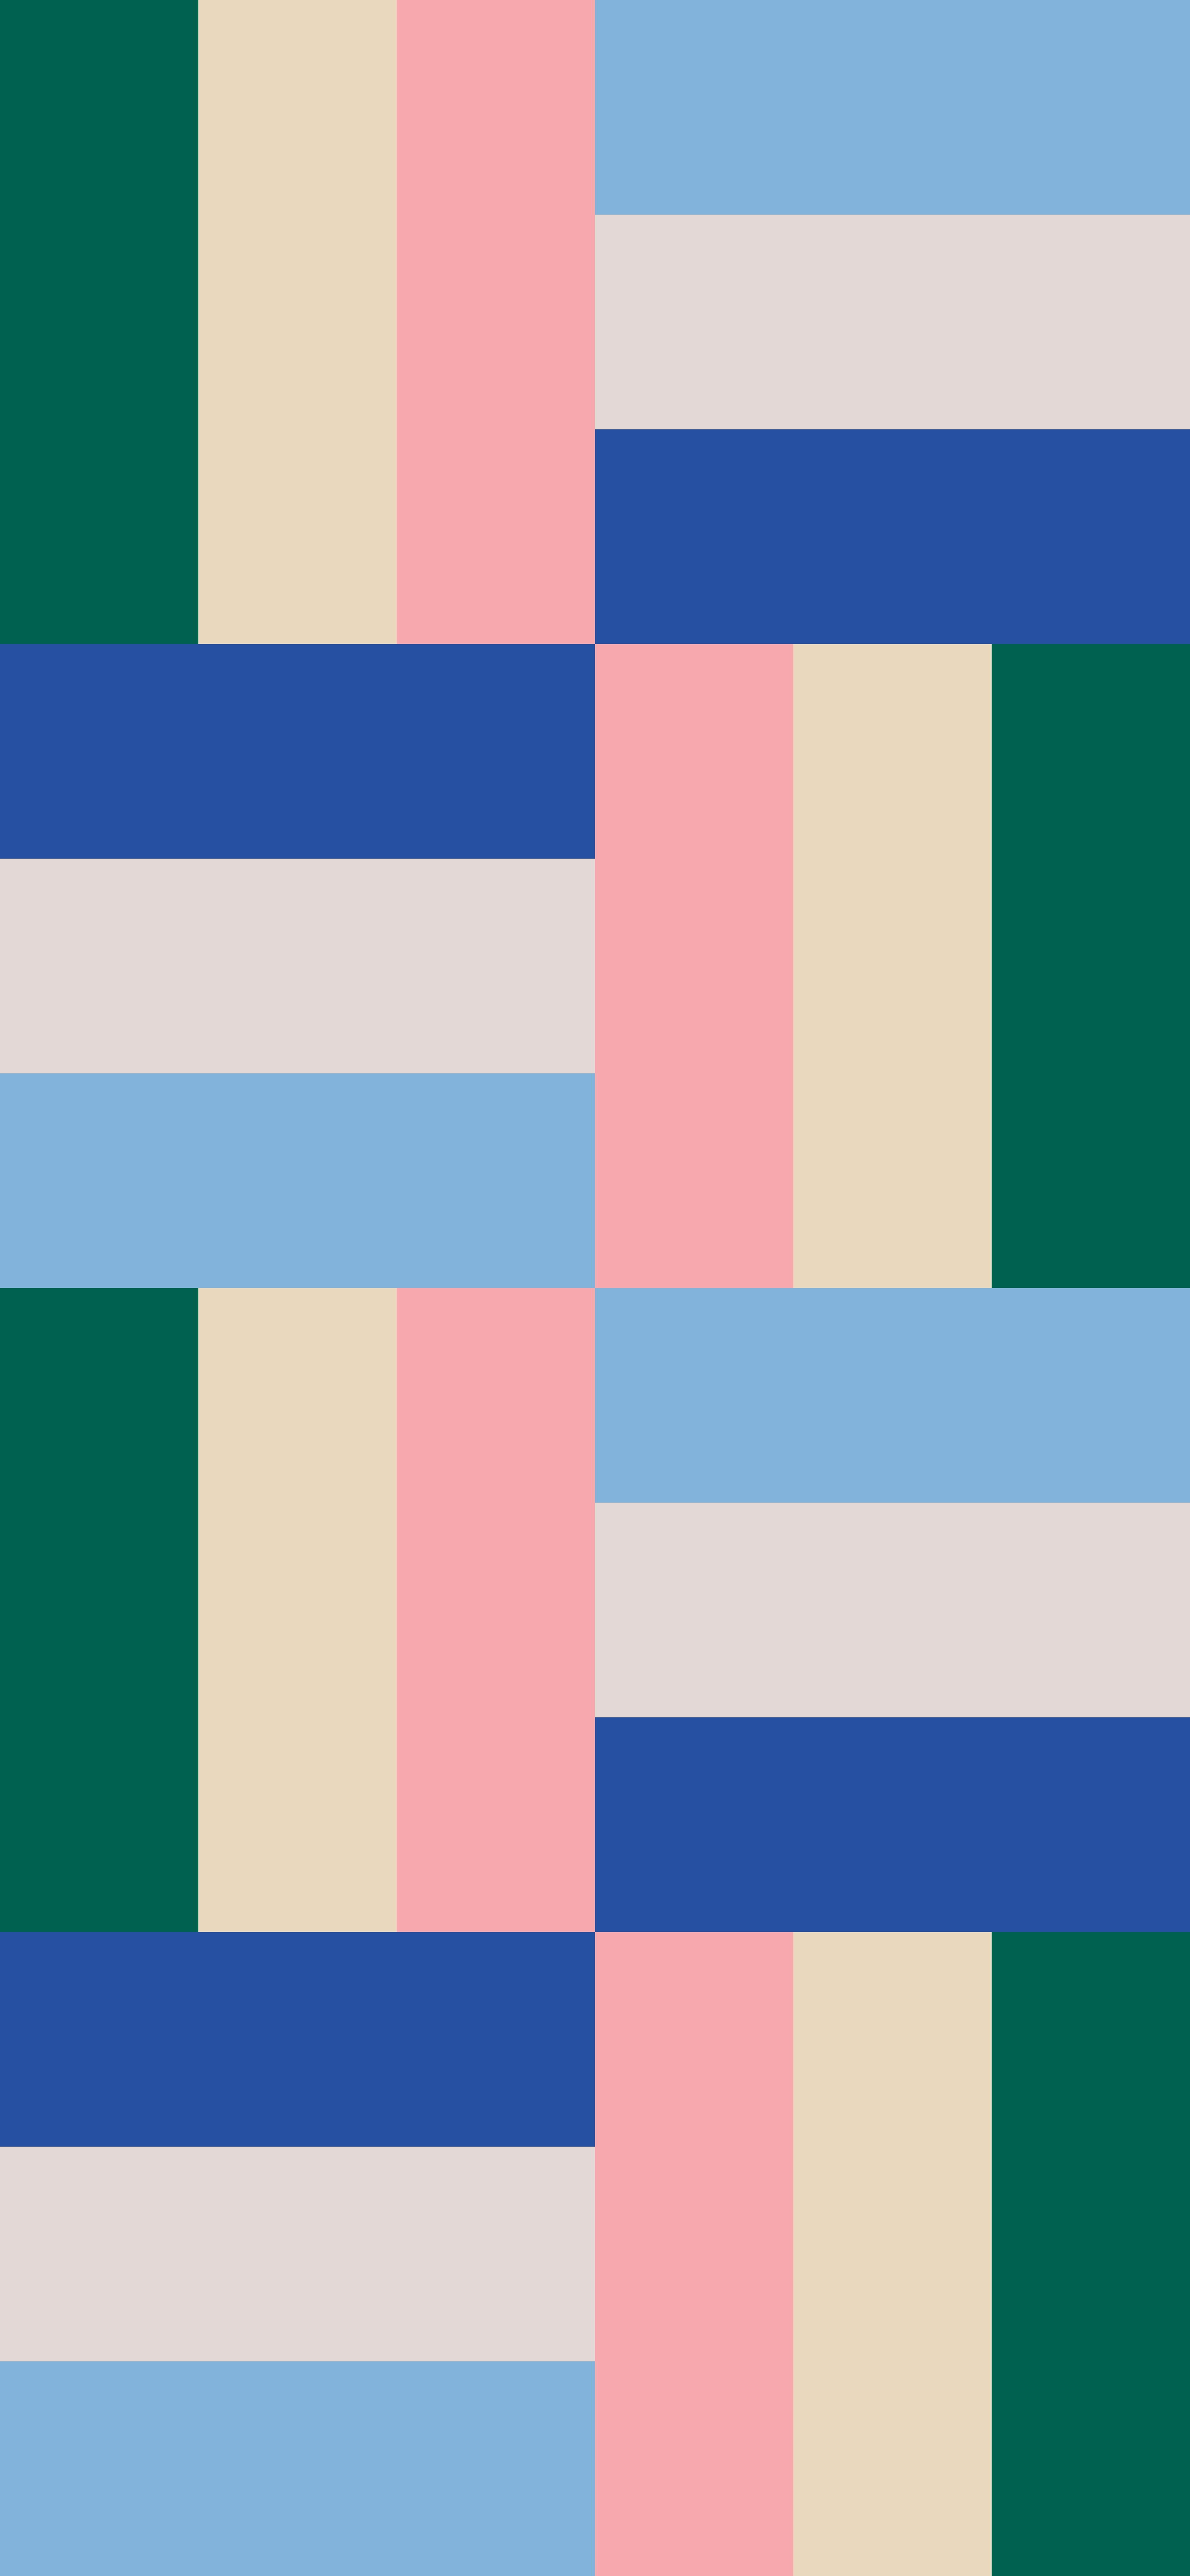 allapplenews-wallpaper-Pattern